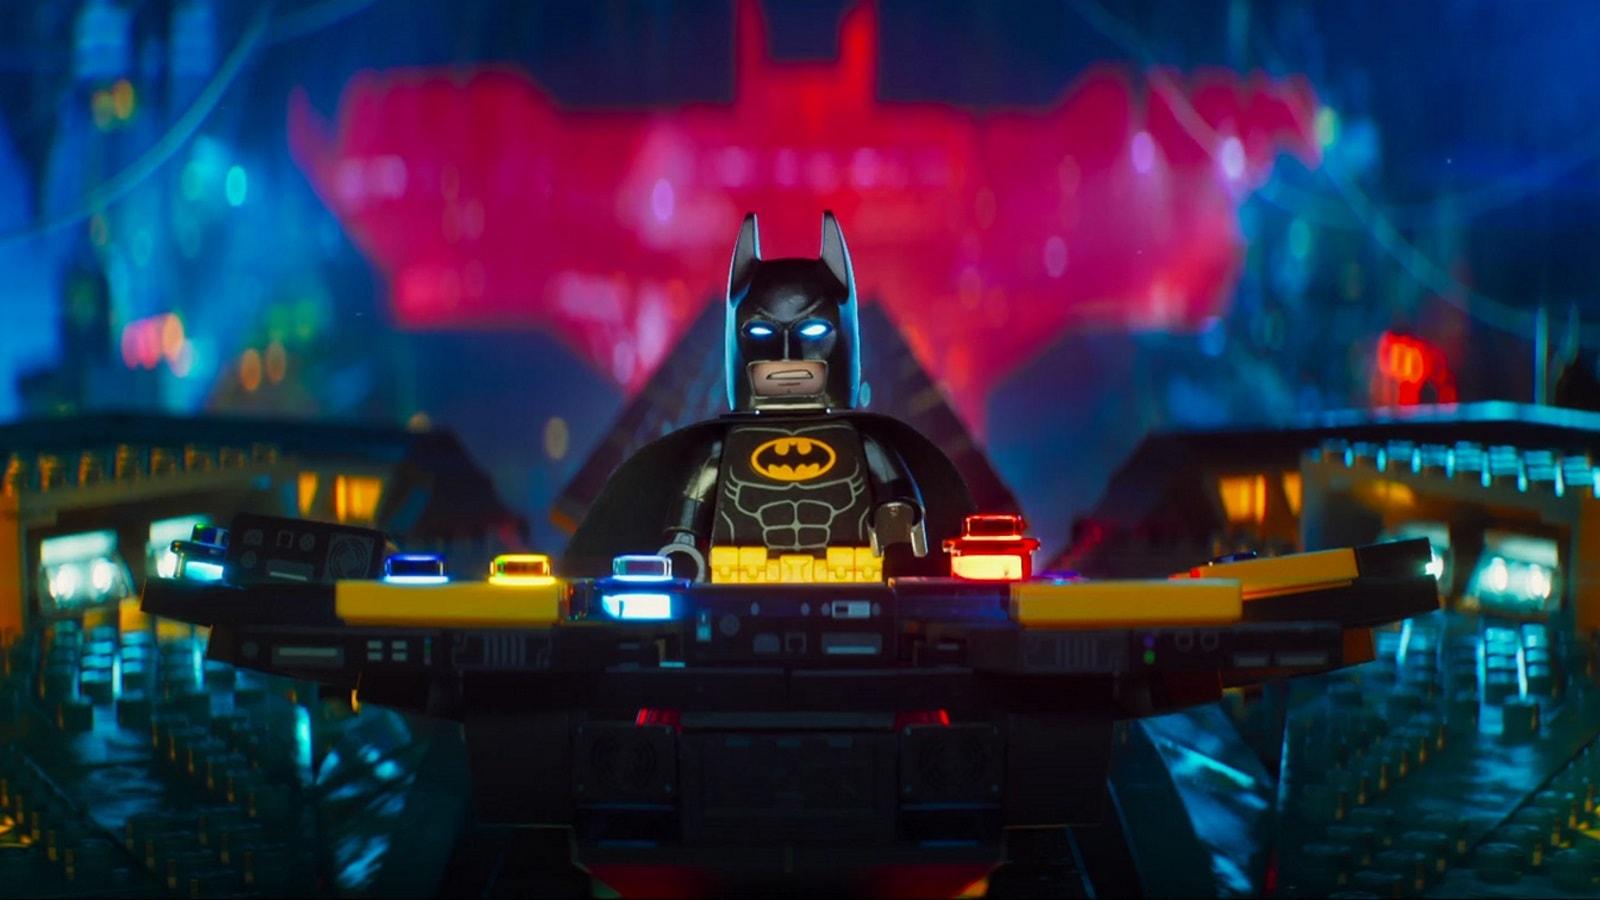 The Lego Batman Movie Desktop wallpaper